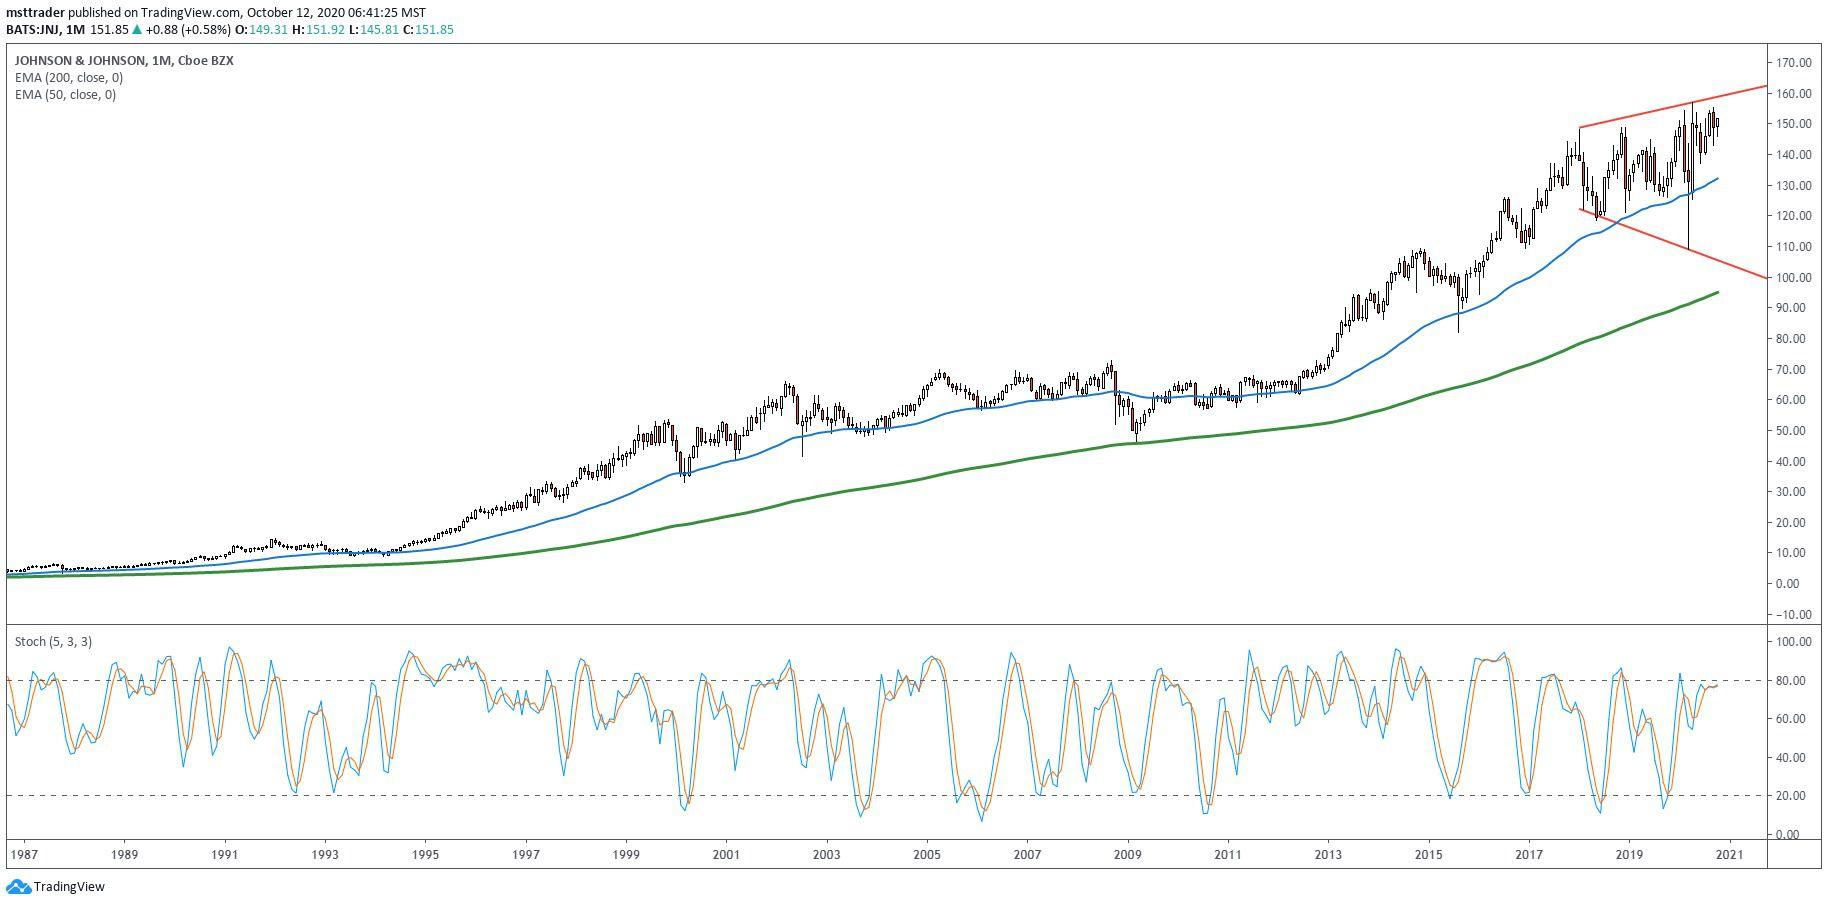 Long-term chart showing the share price performance of Johnson & Johnson (JNJ)